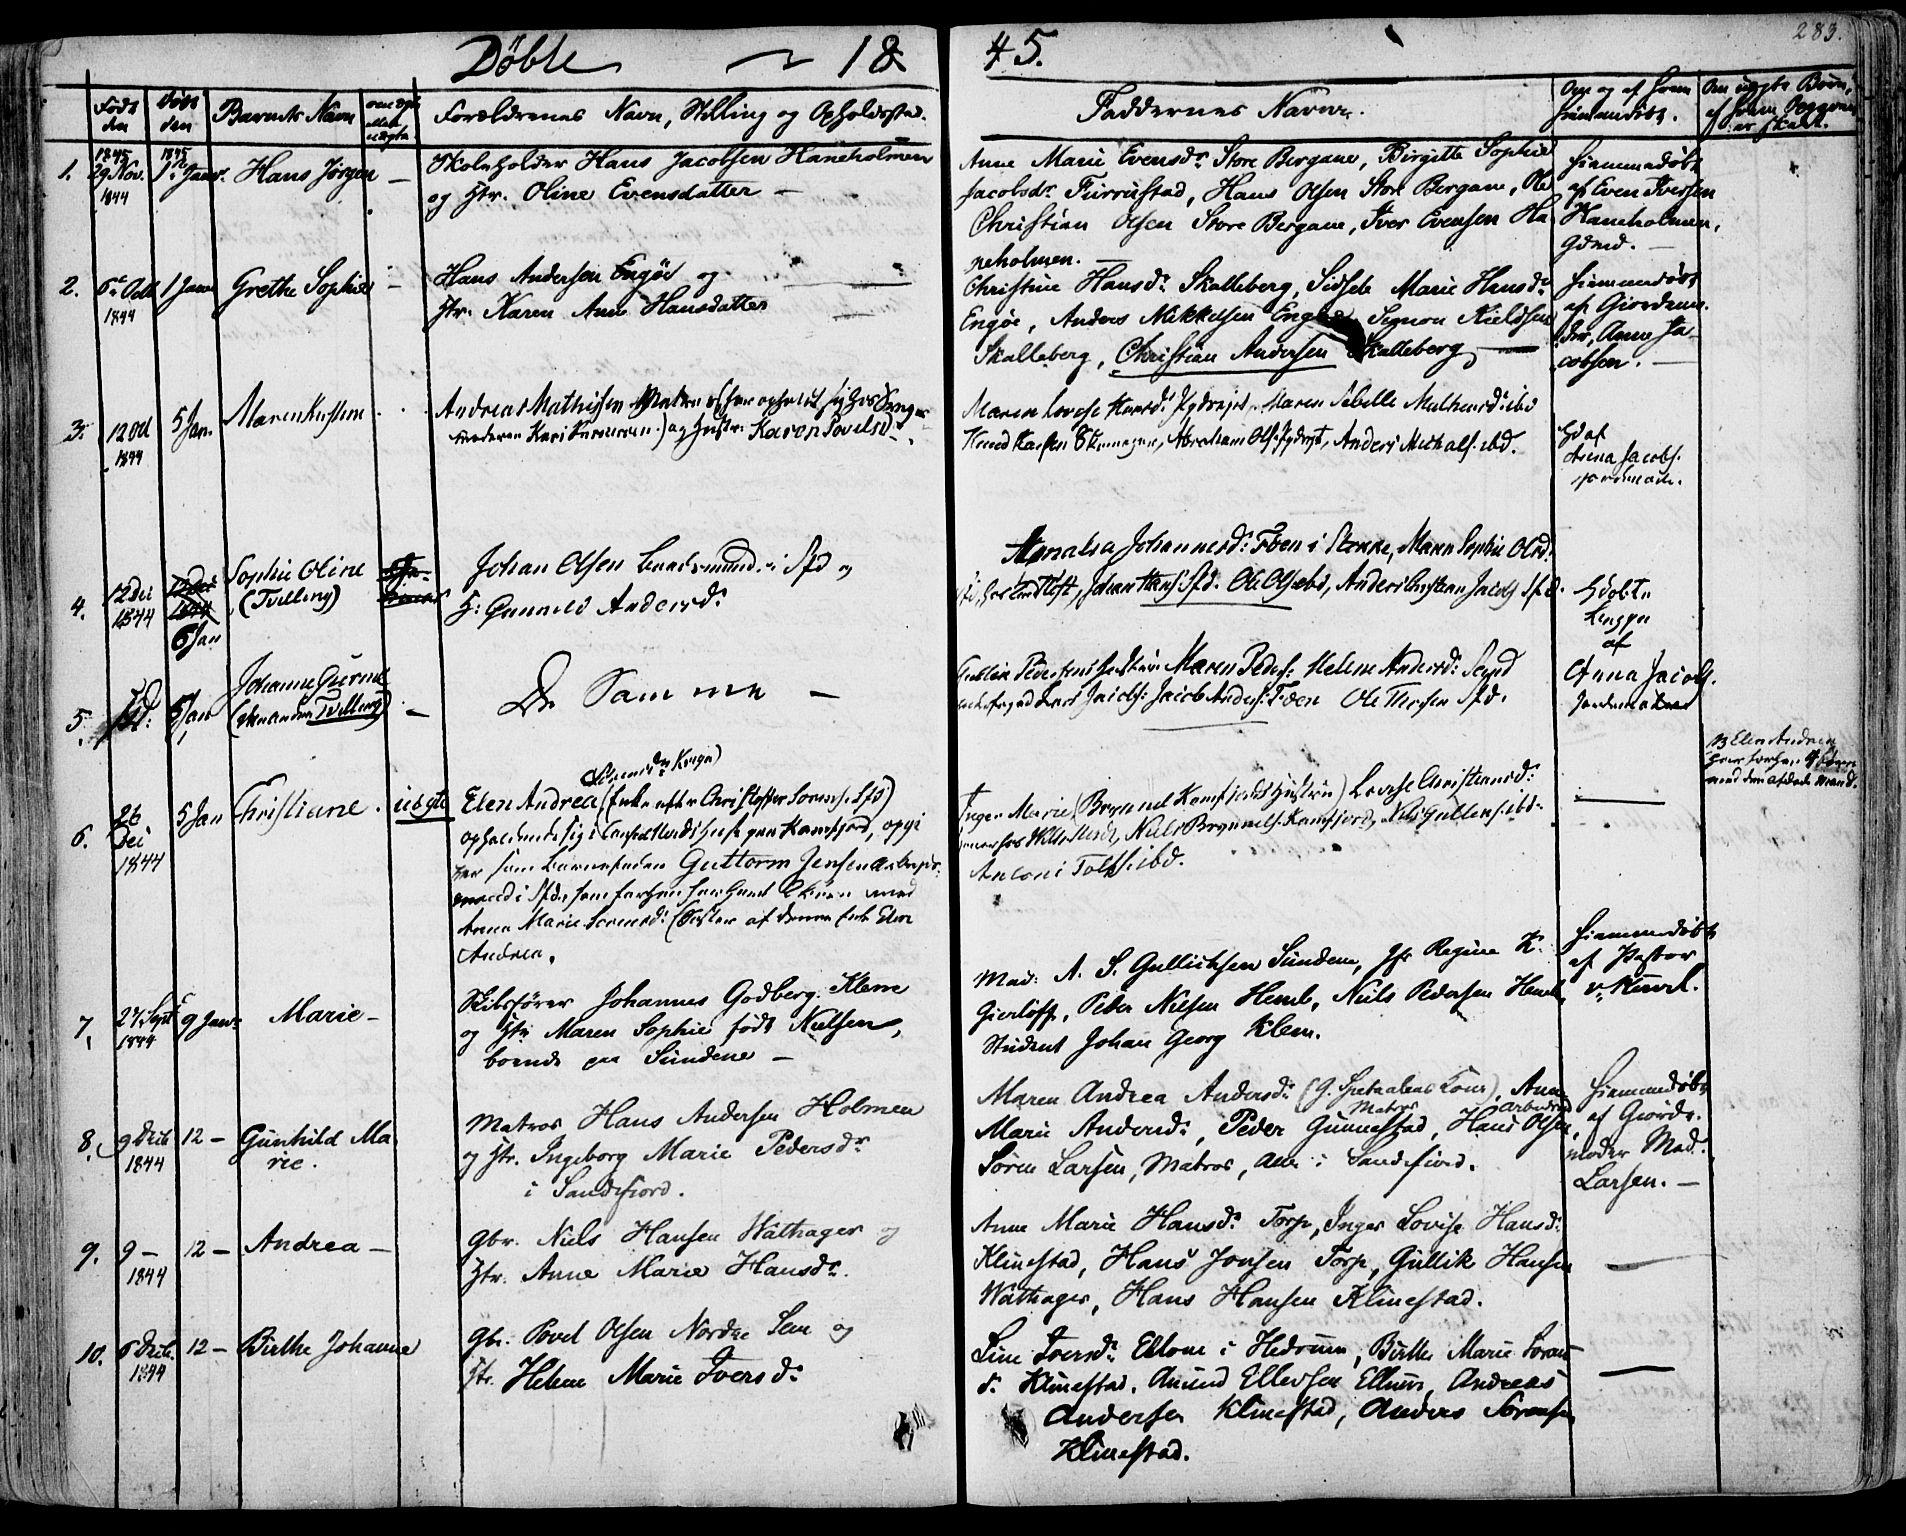 SAKO, Sandar kirkebøker, F/Fa/L0005: Parish register (official) no. 5, 1832-1847, p. 282-283